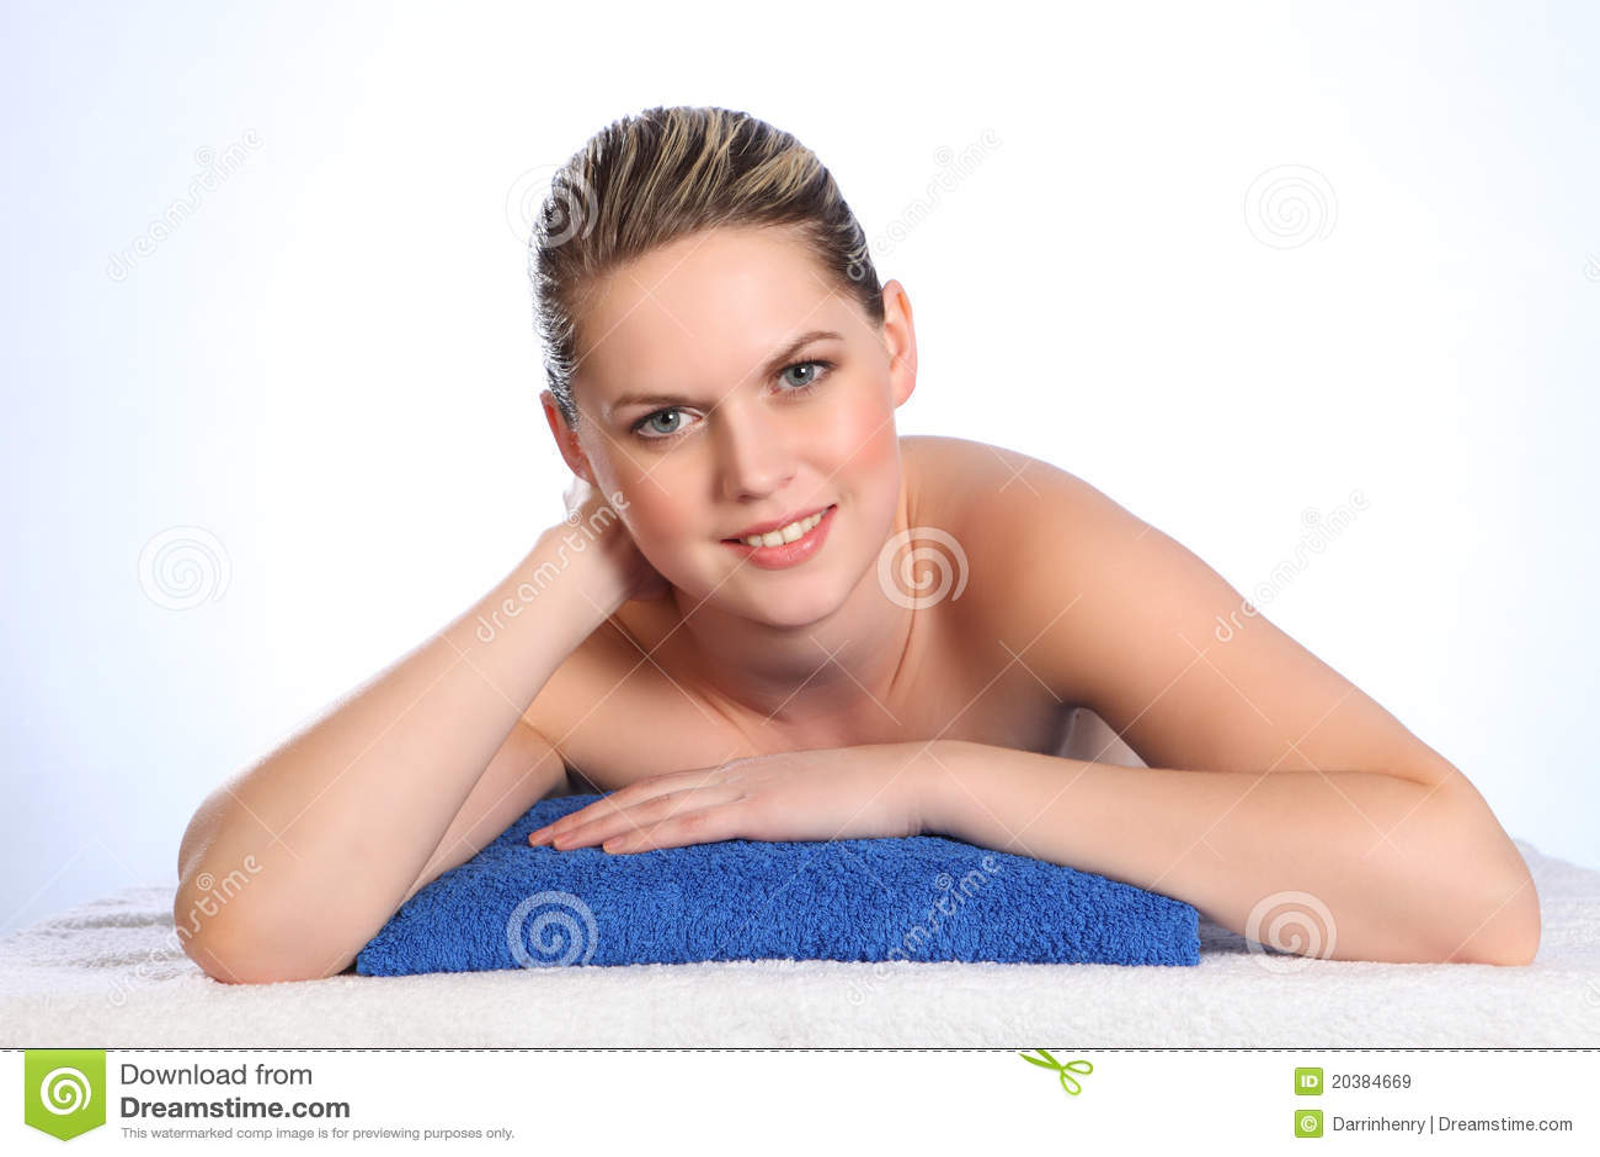 tantra massage center nude hot massage